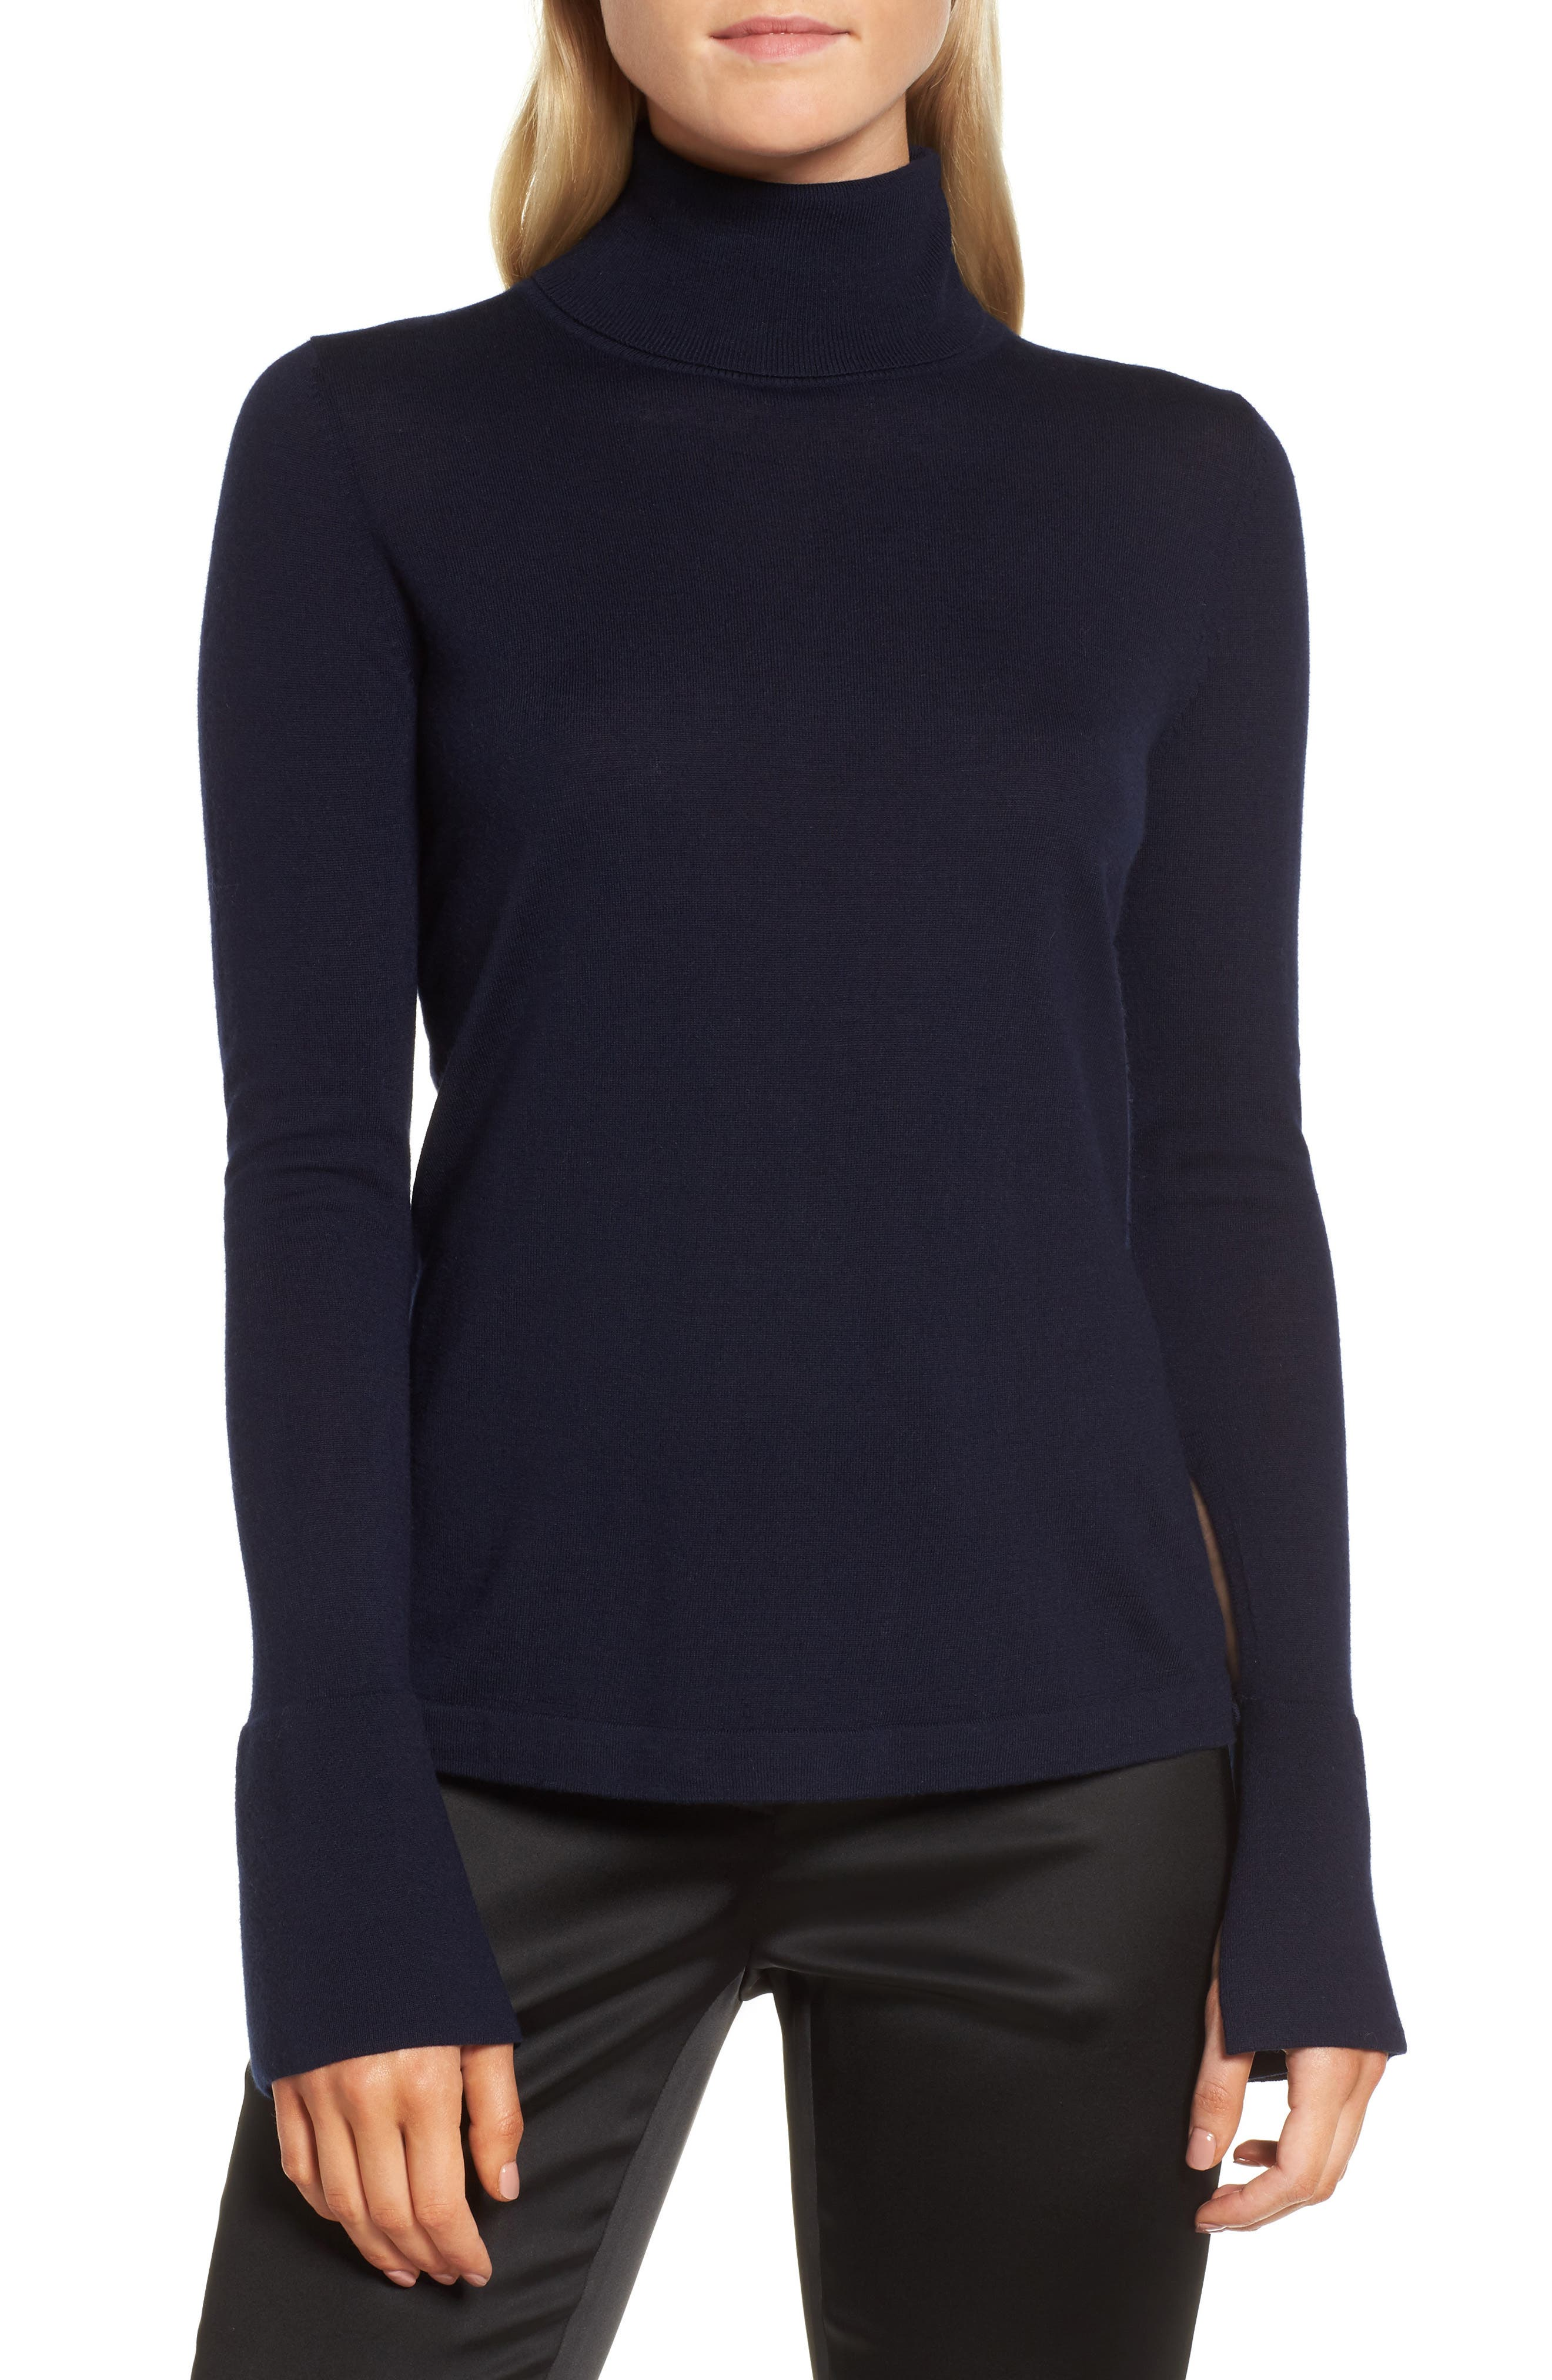 Main Image - Lewit Split Cuff Merino Wool Turtleneck Sweater